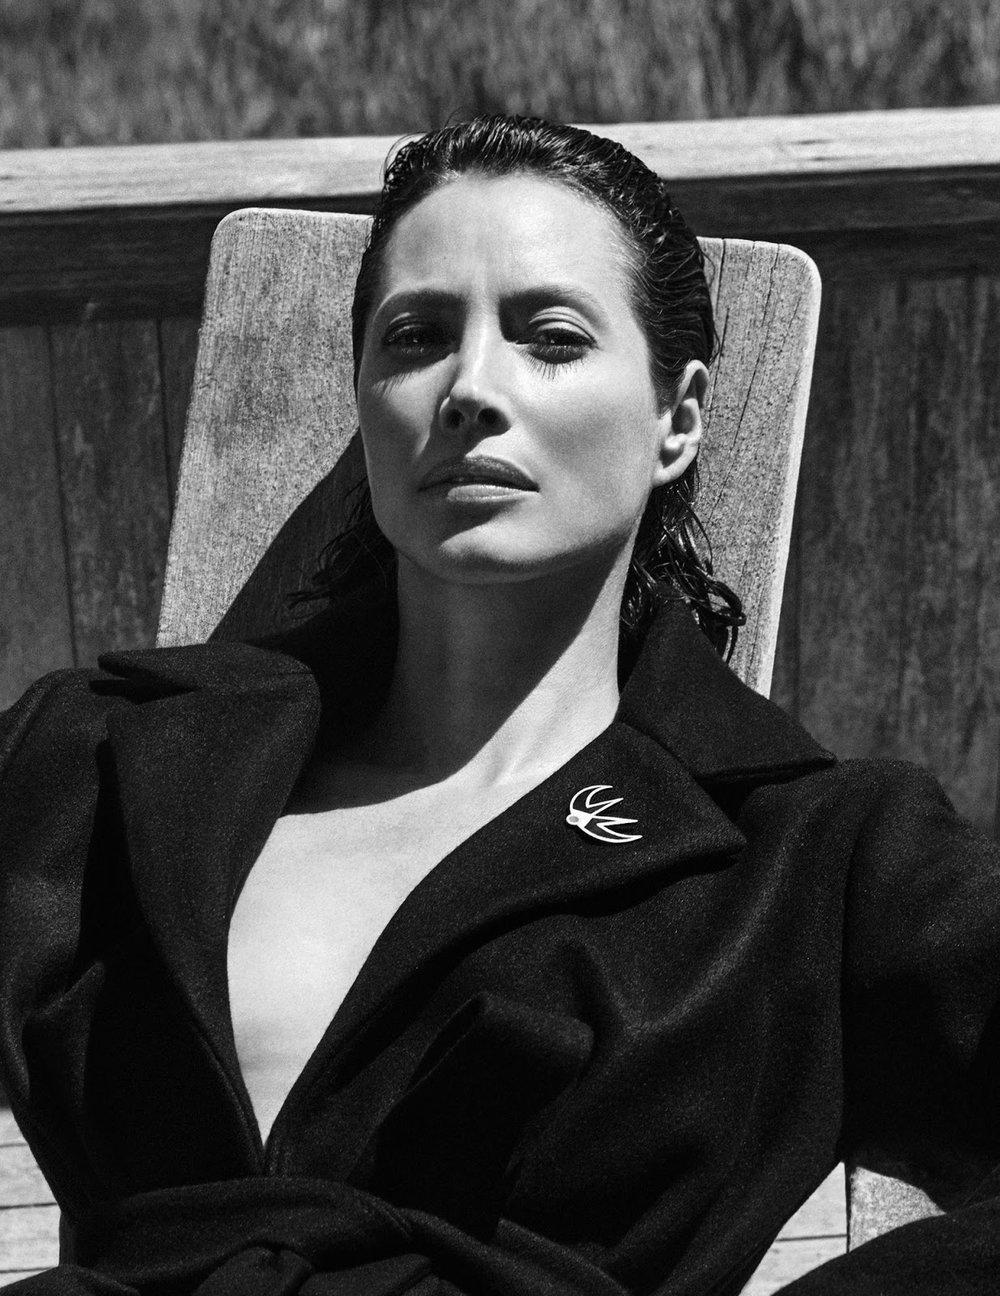 Christy Turlington by Chris Colls for Vogue Poland September 2018 (7).jpg